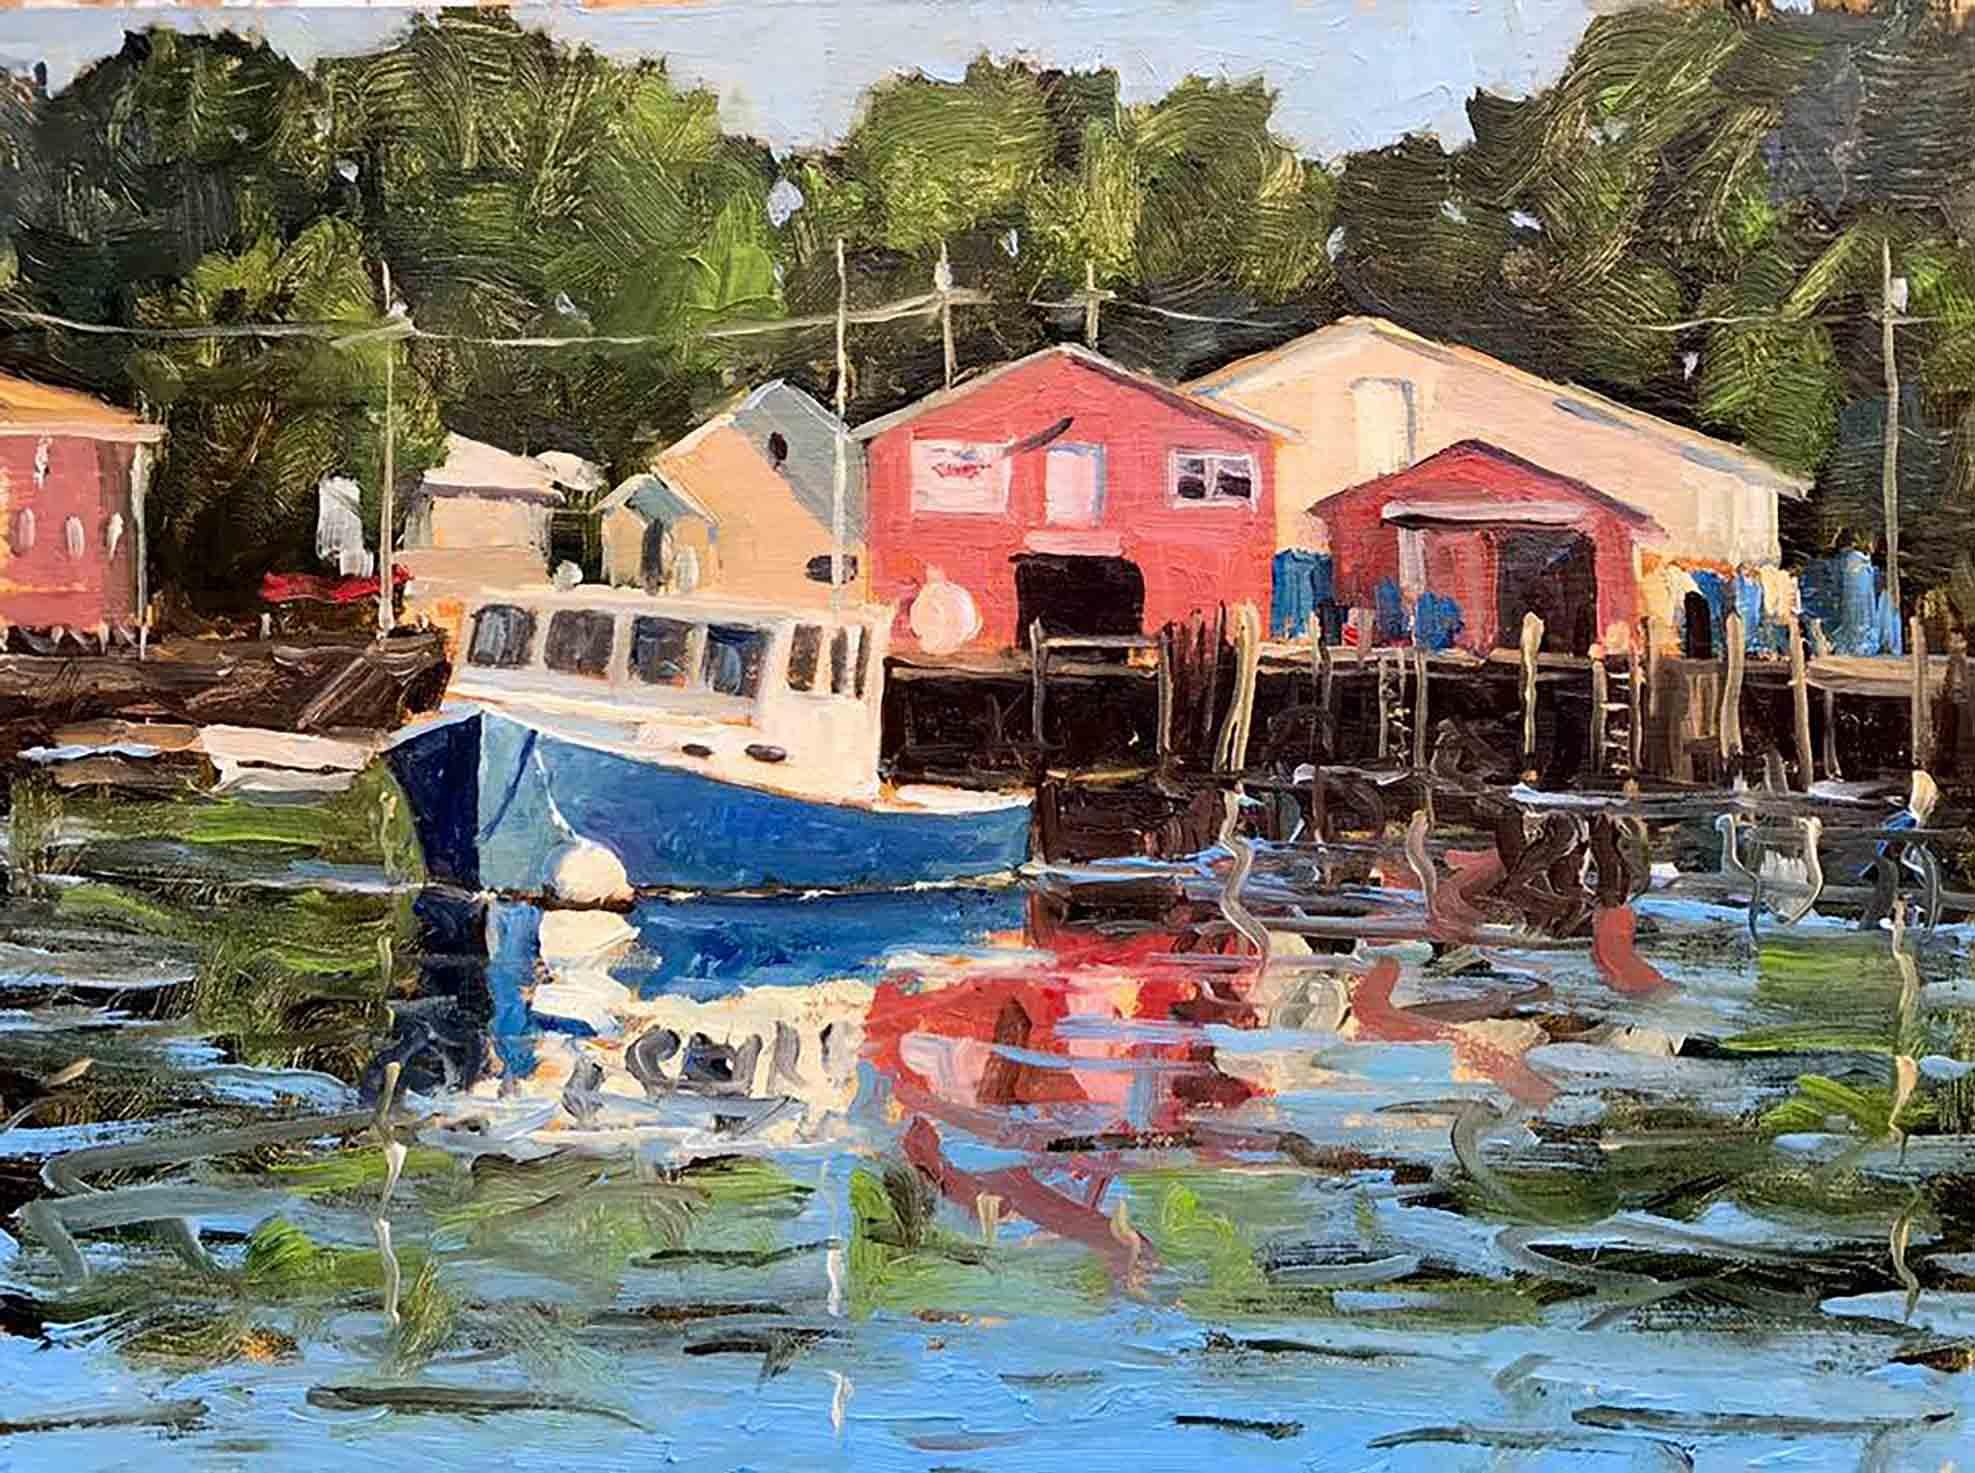 Blue-Lobster-Boat-in-the-Harbor_web.jpg